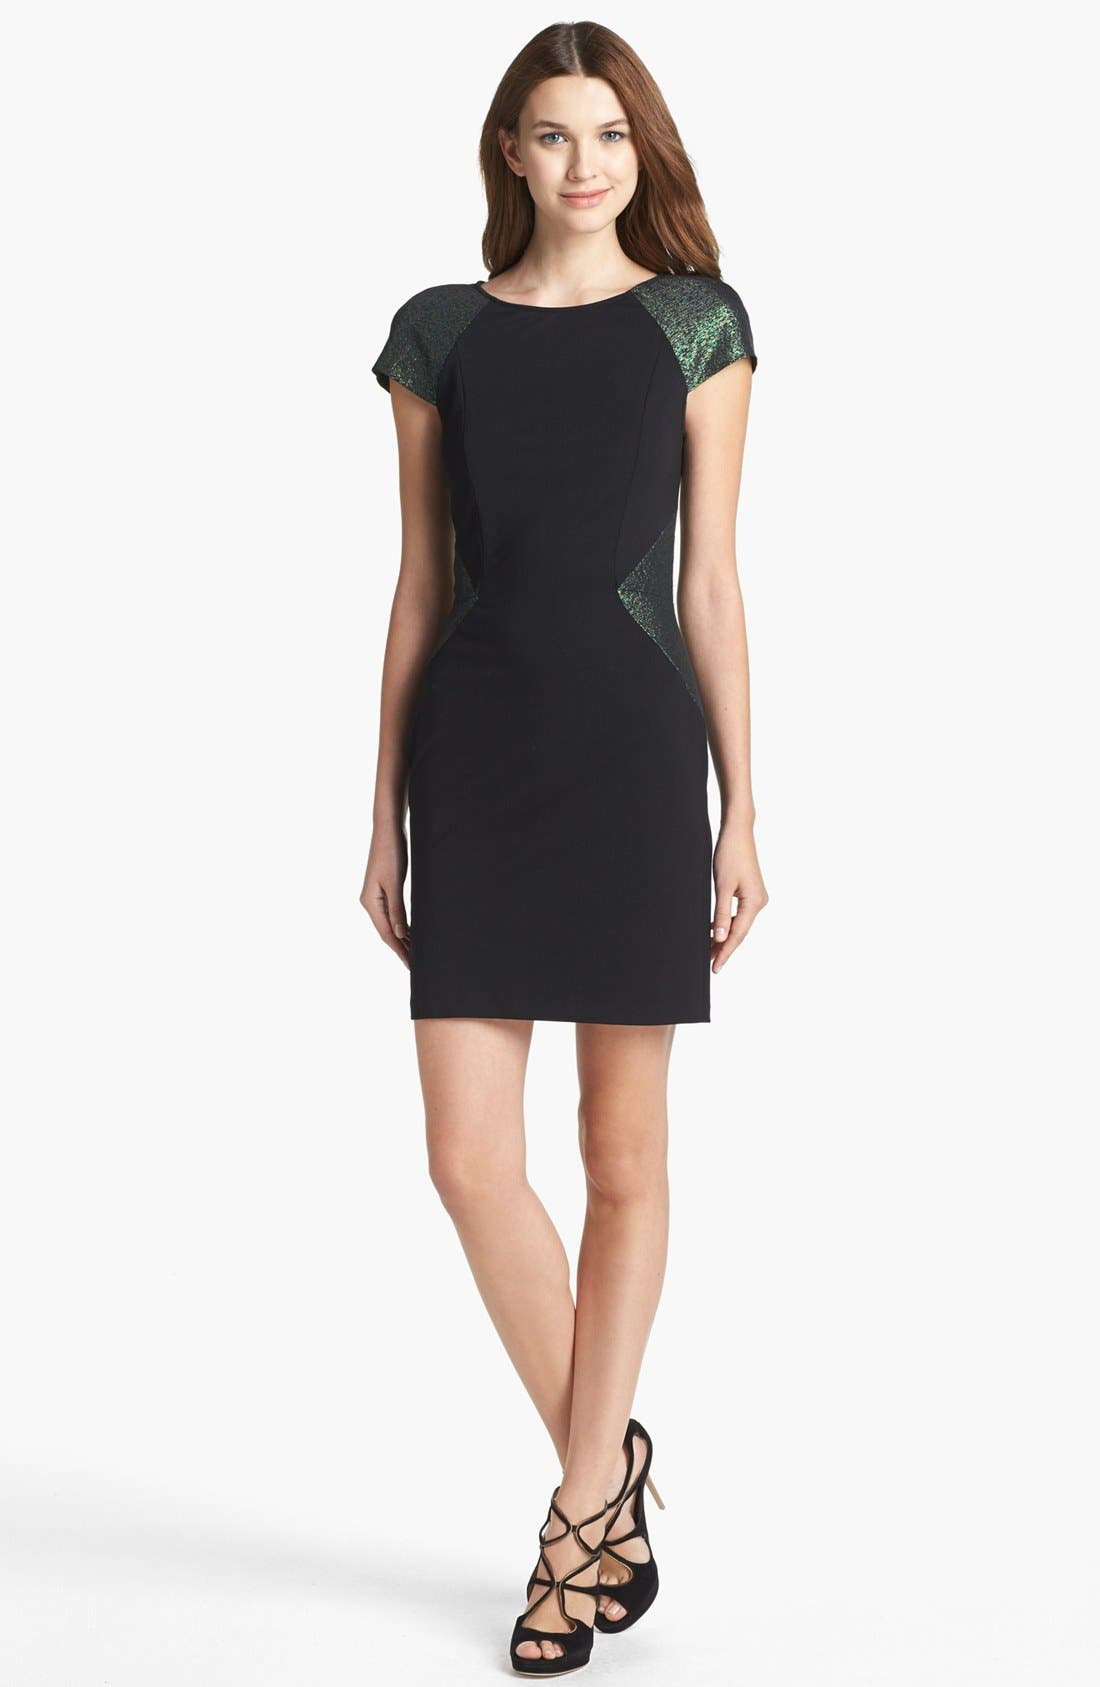 Alternate Image 1 Selected - ERIN erin fetherston 'Eliane' Jacquard Colorblock Sheath Dress